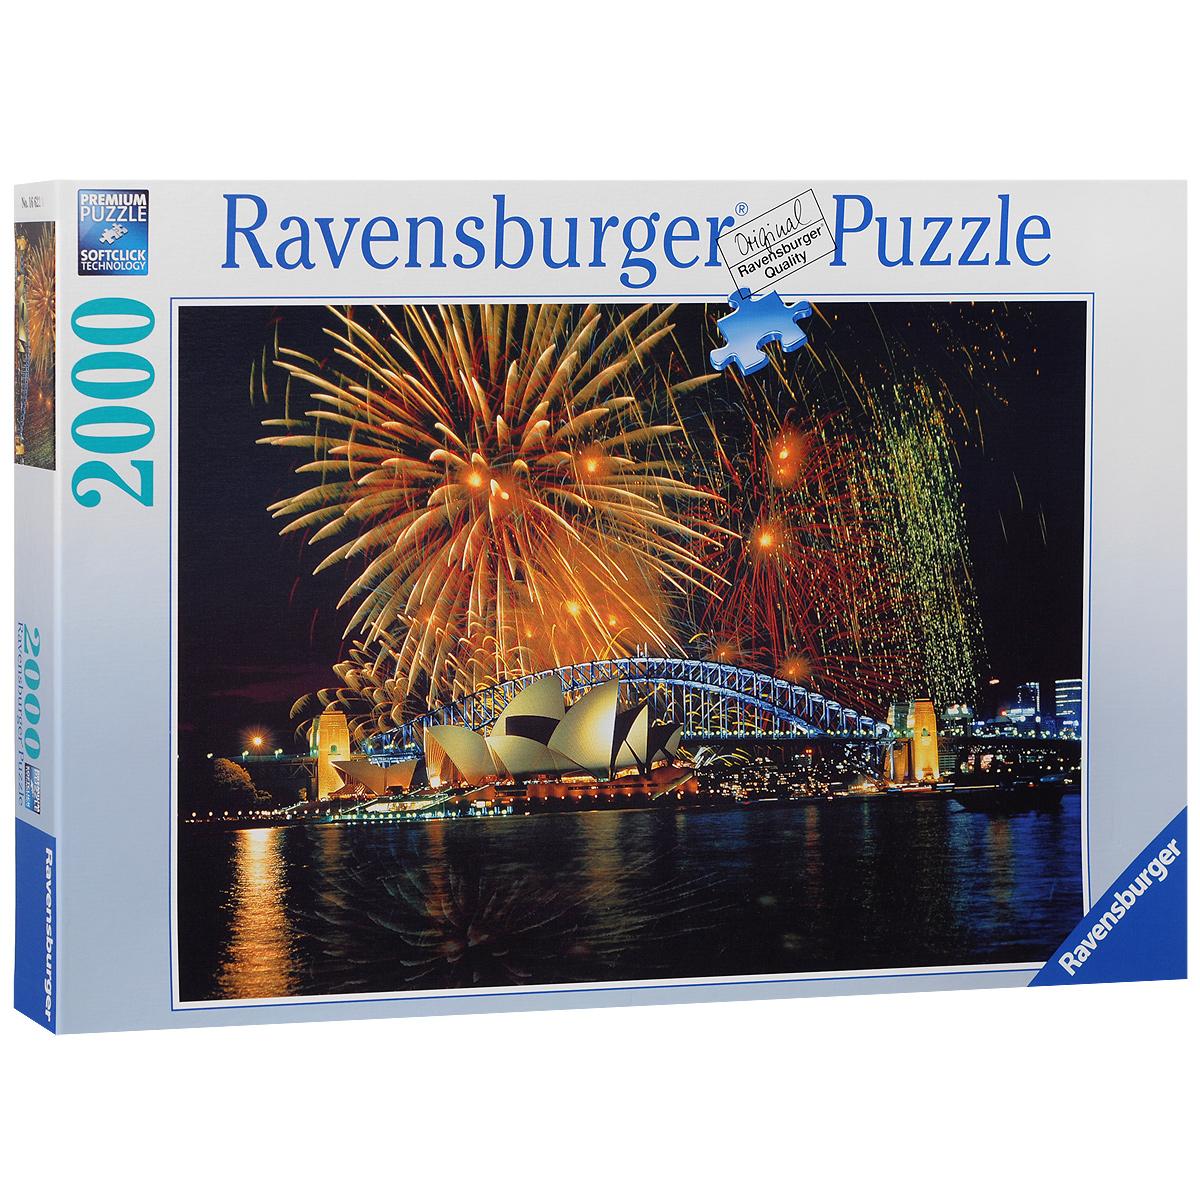 Ravensburger Фейерверк над Сиднеем. Пазл, 2000 элементов